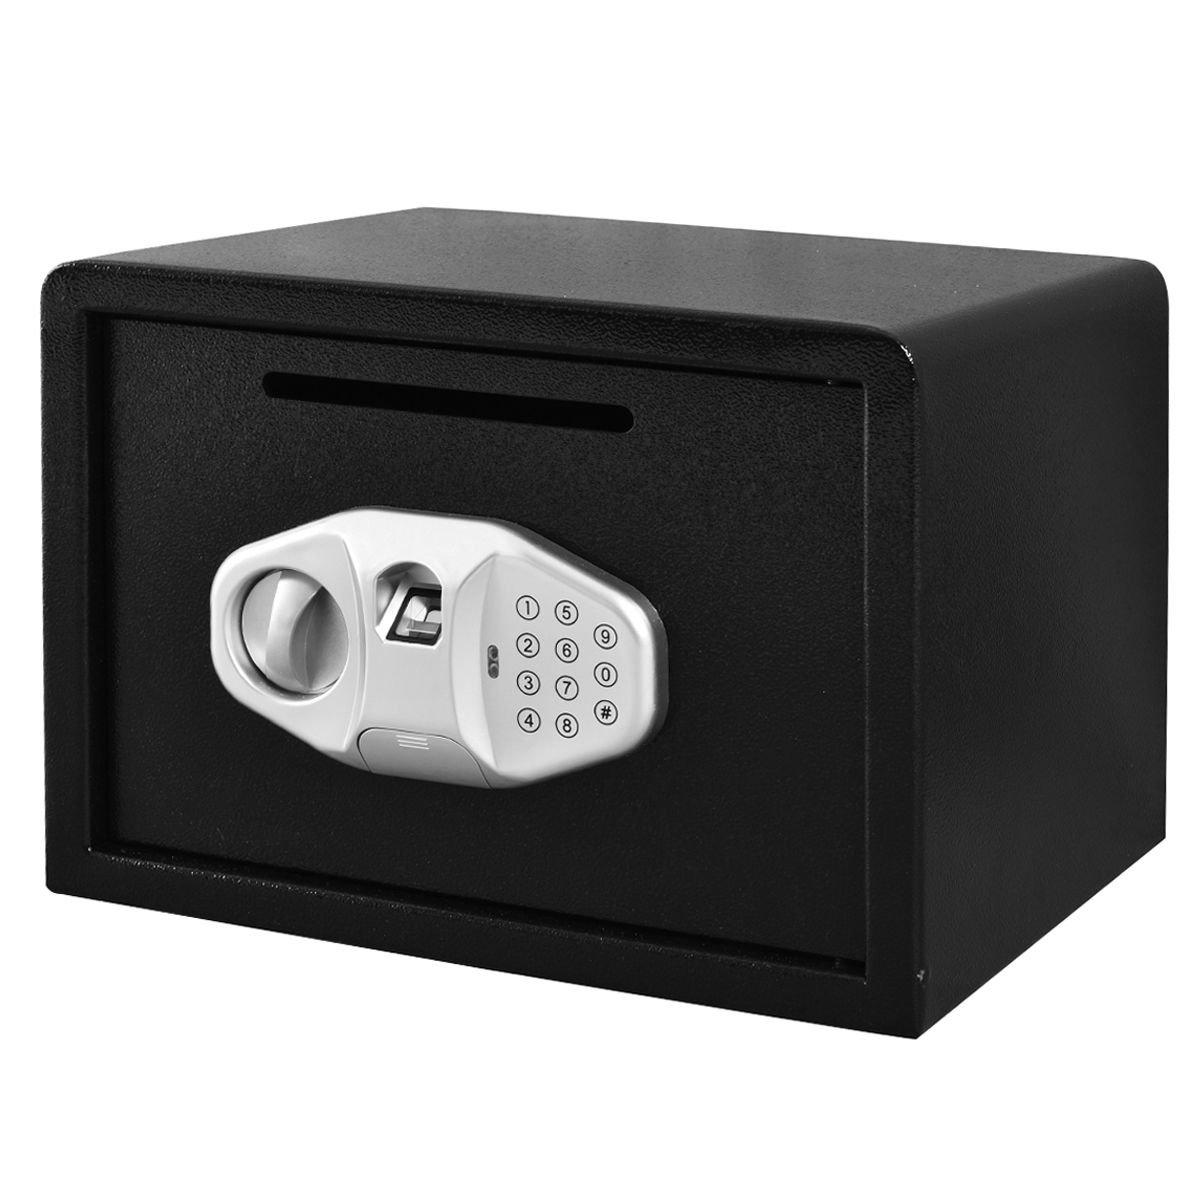 Safstar Cabinet Safes Biometric Fingerprint Electronic Digital Keypad Lock Security Box for Cash Jewelry Passport Guns Collectibles (FS Fingerprint: 9.8'' x 13.7'' x 9.8'') by S AFSTAR (Image #2)